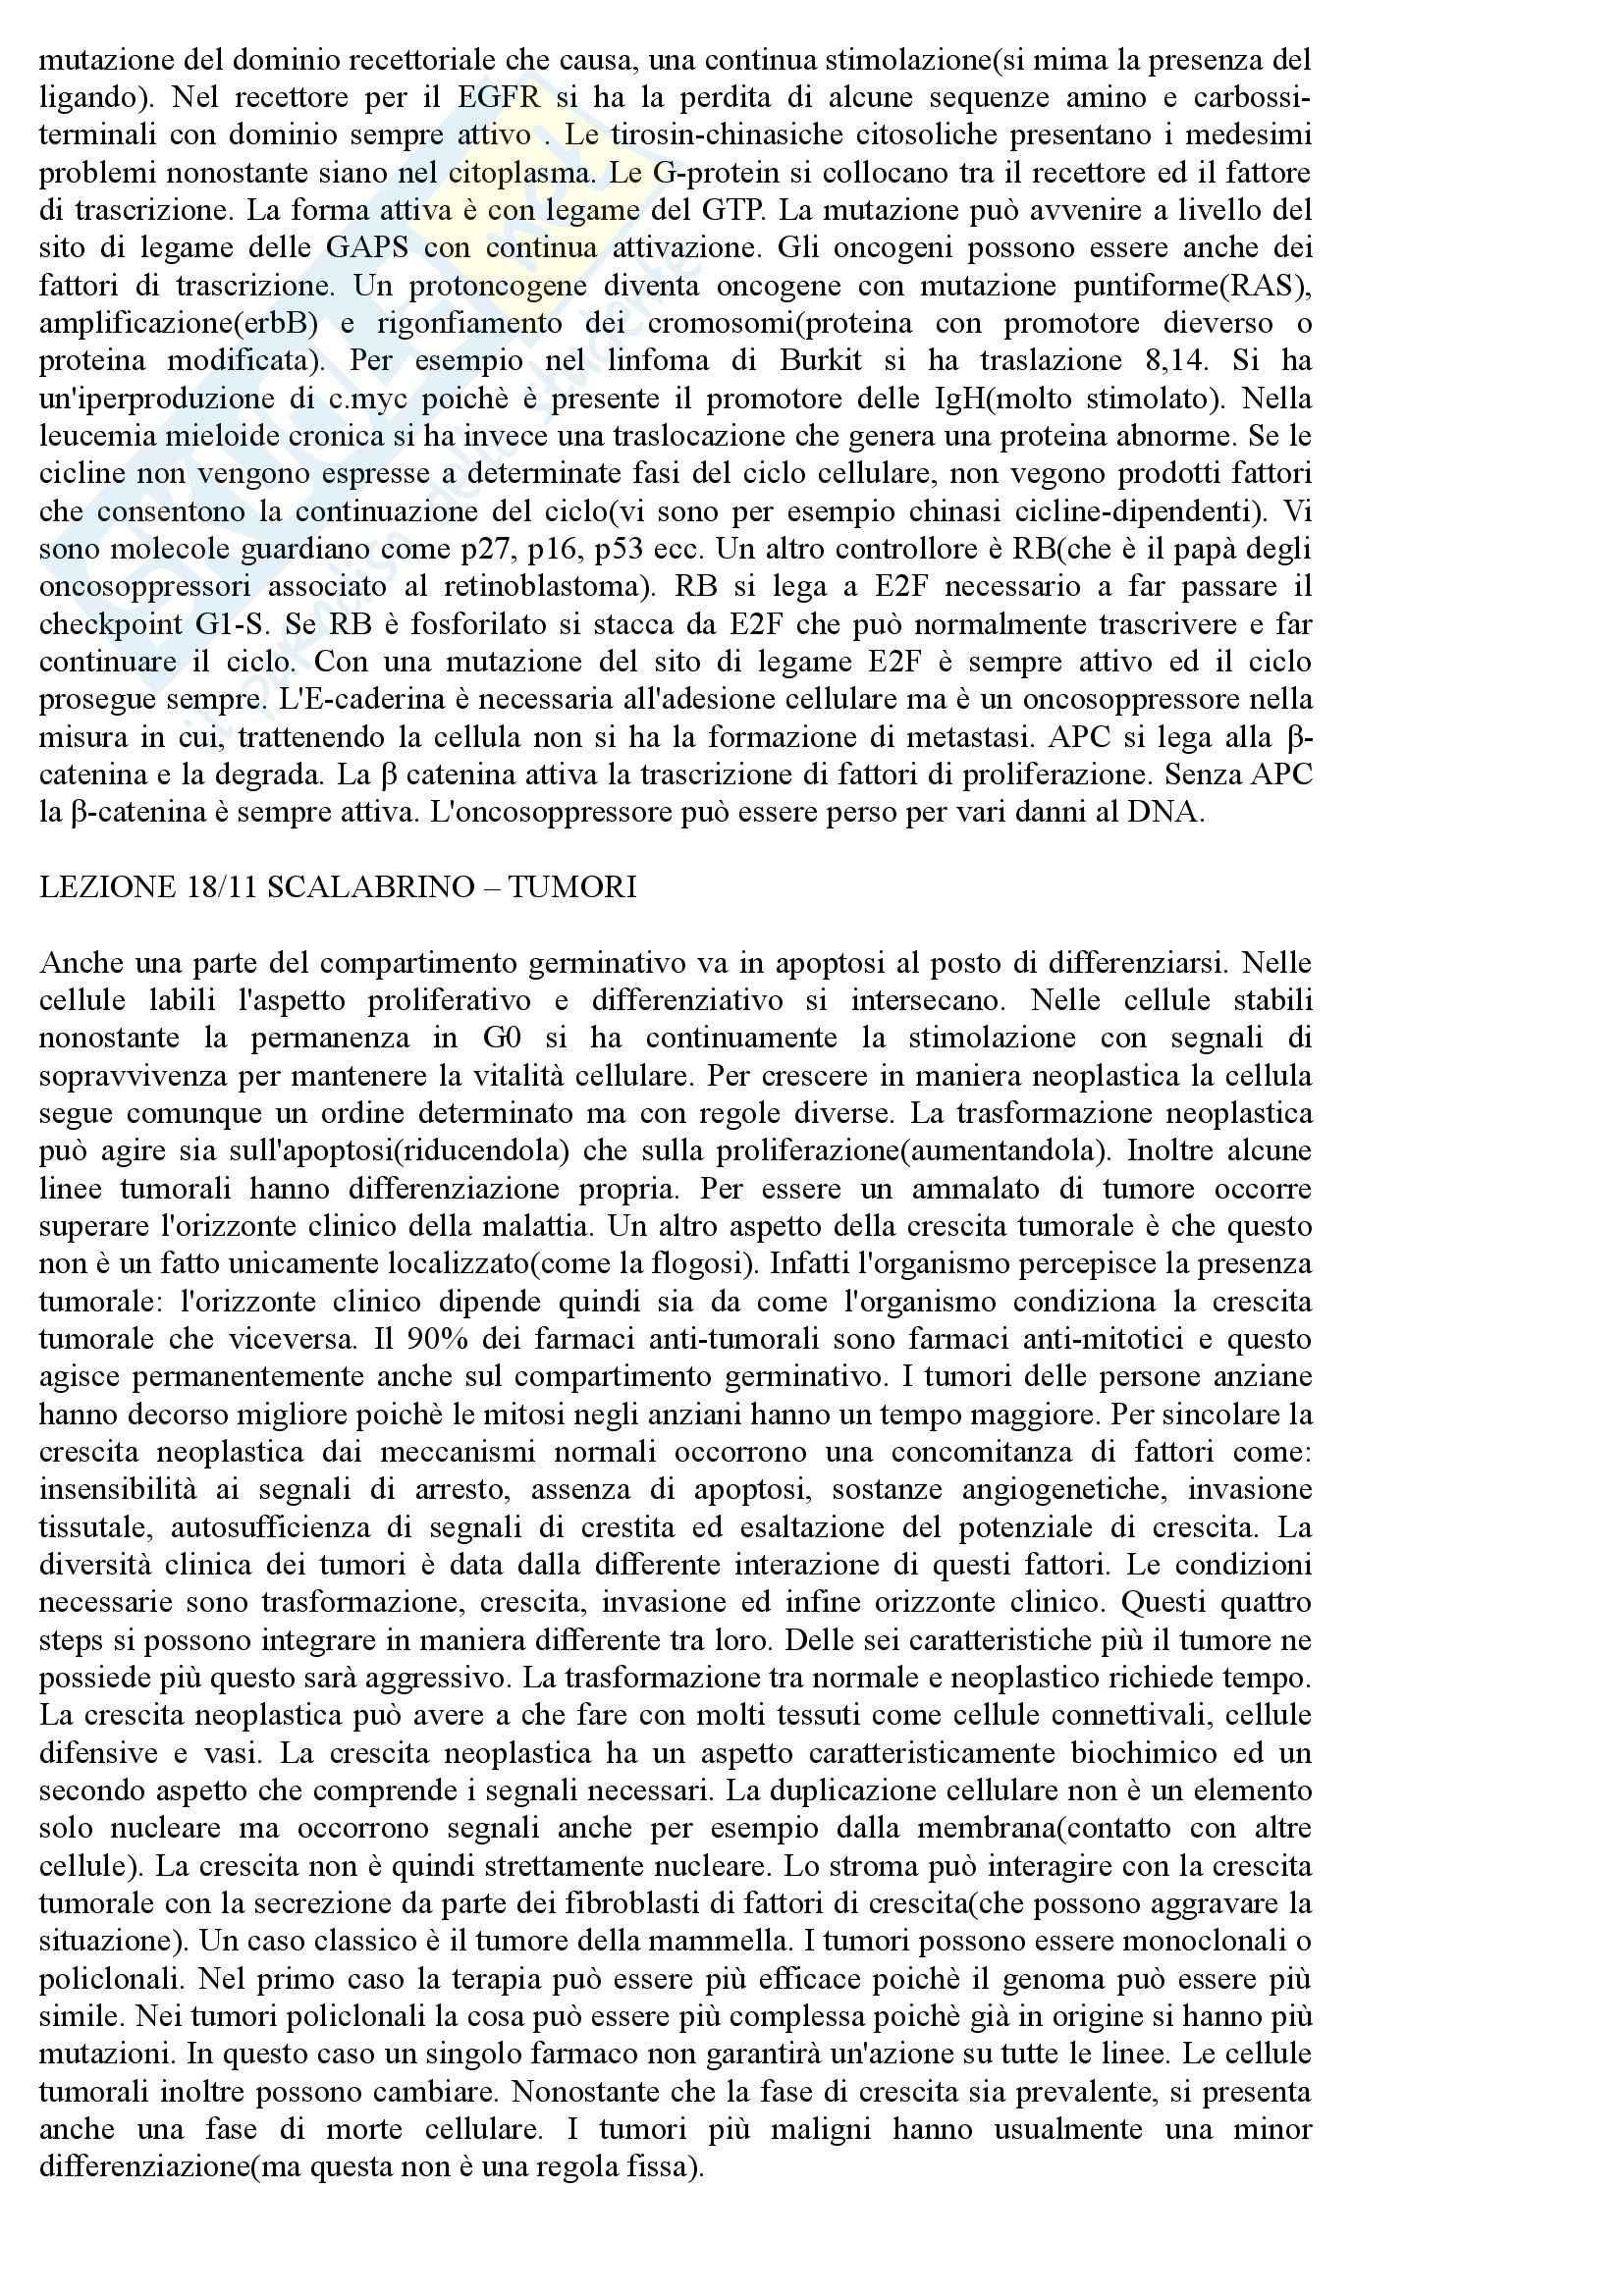 Patologia Generale - Appunti Pag. 31